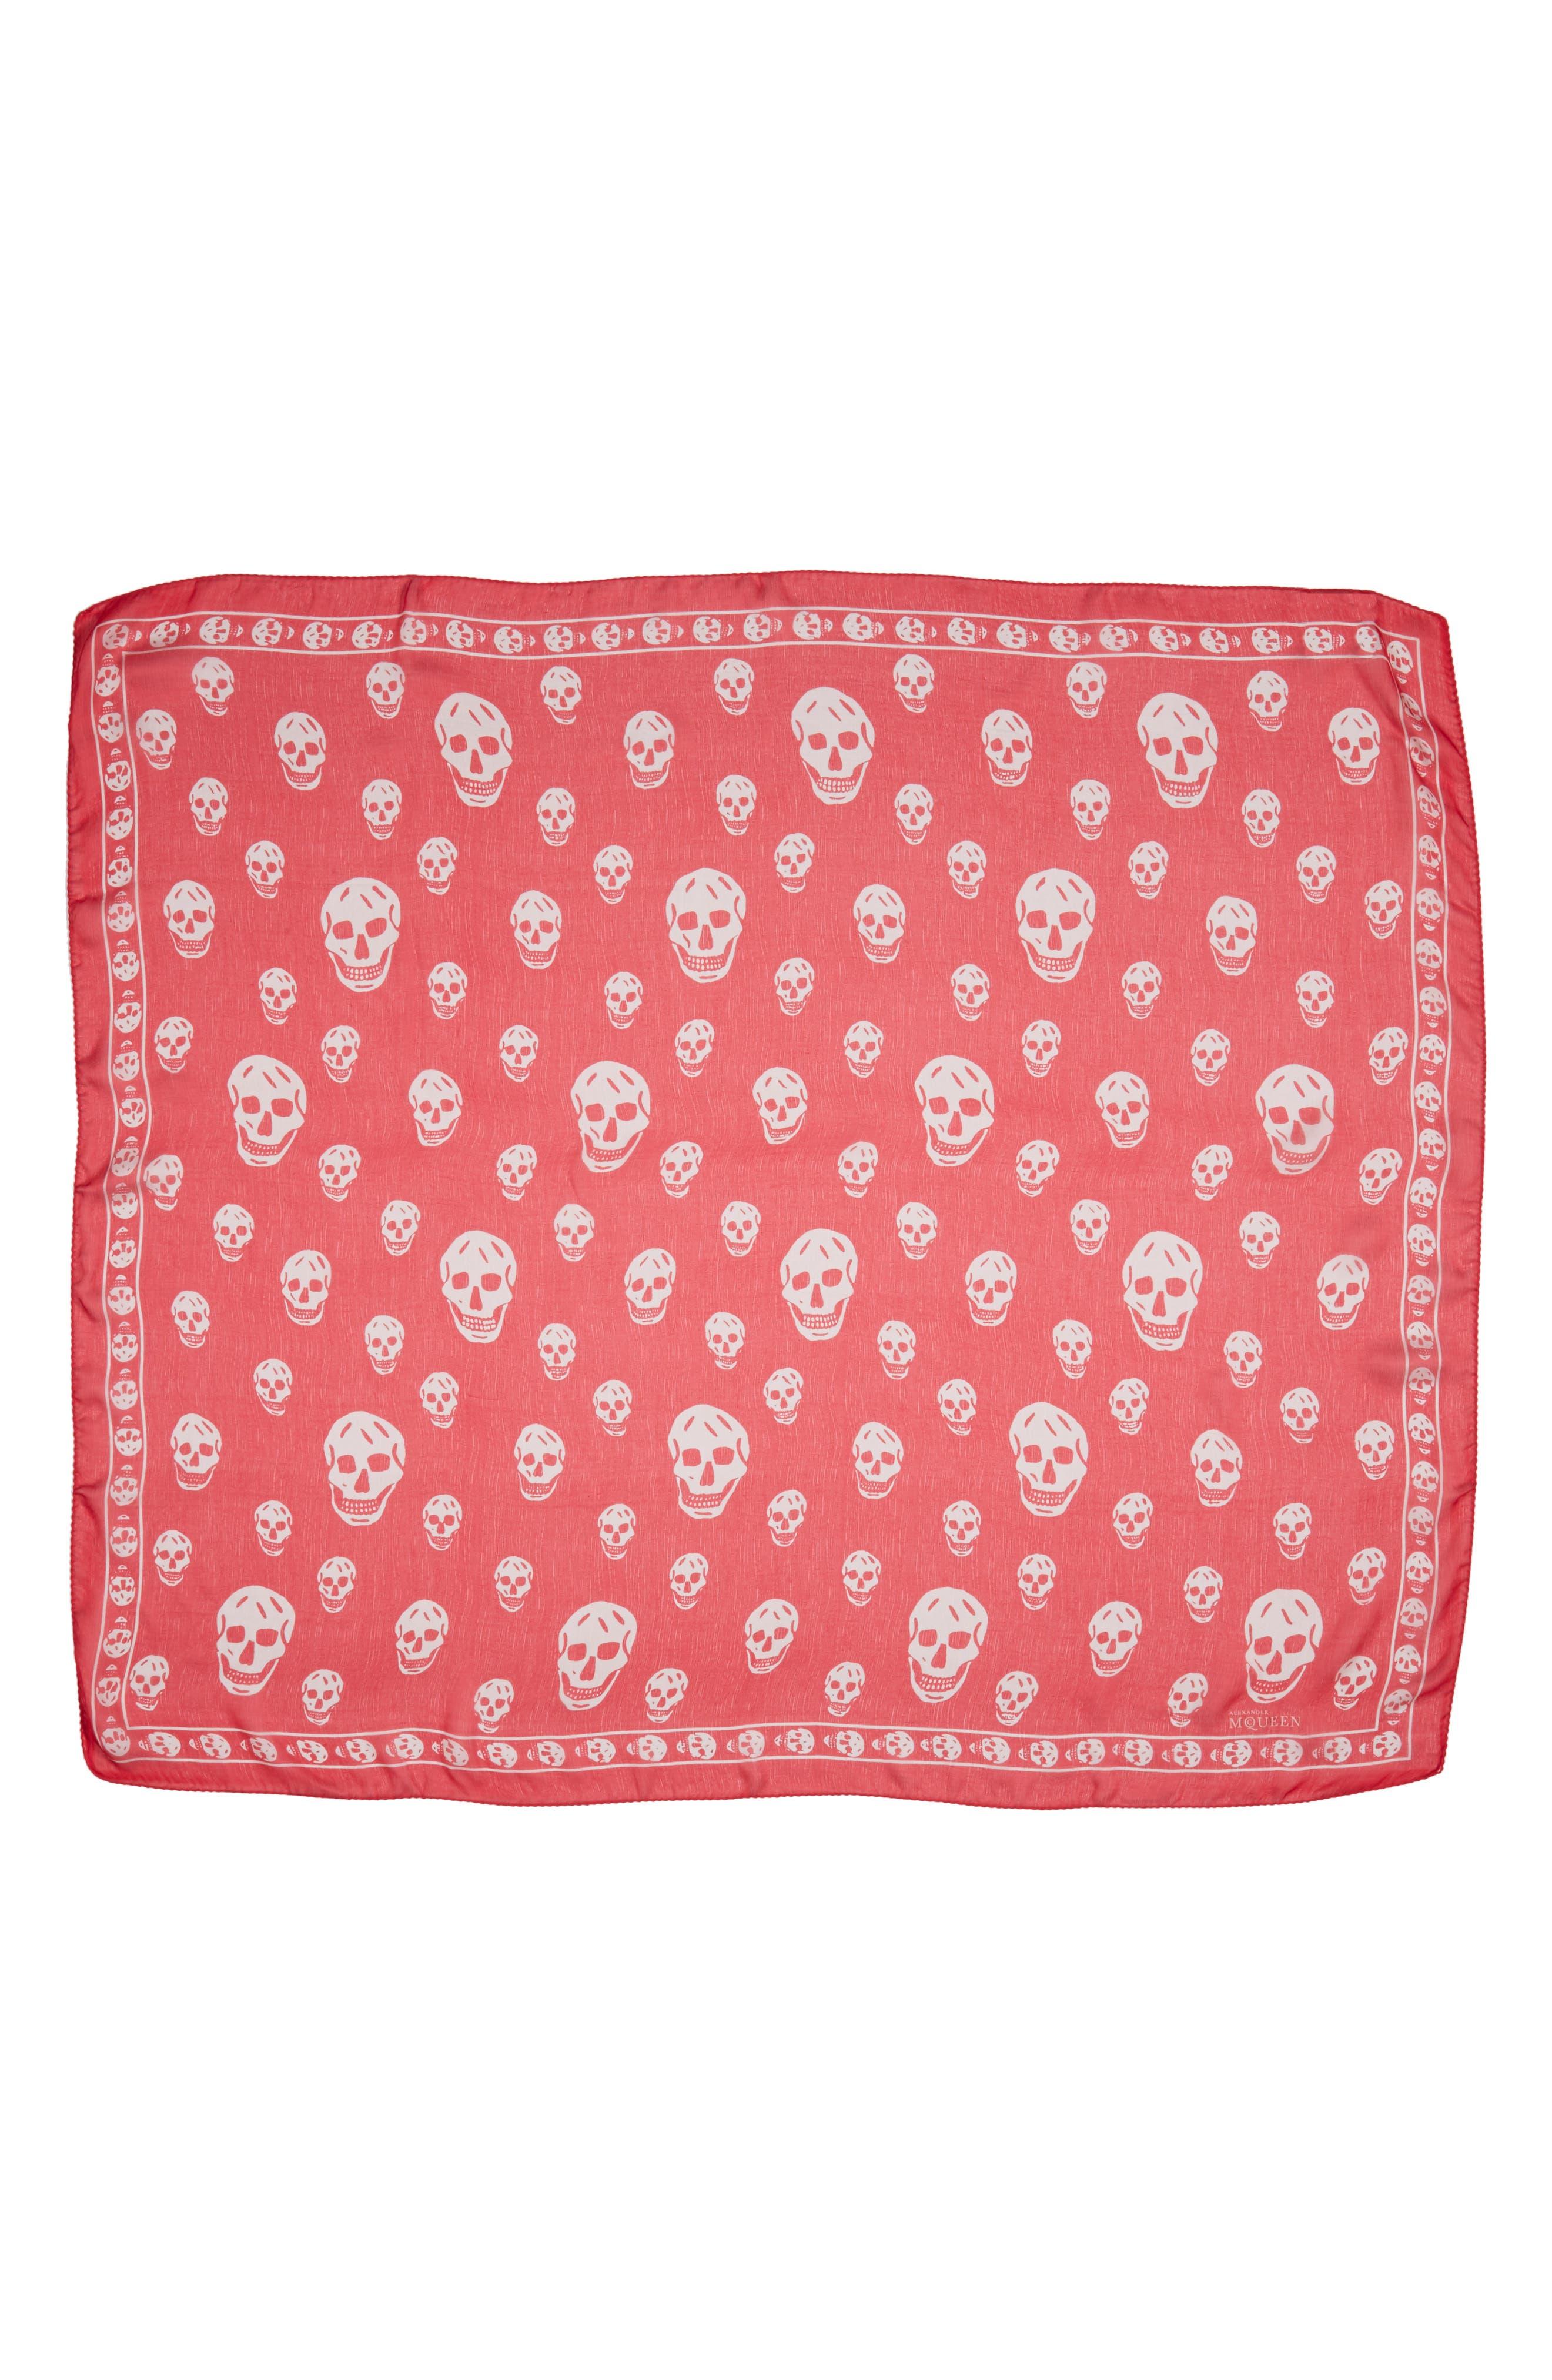 ALEXANDER MCQUEEN, 'Skull' Chiffon Scarf, Main thumbnail 1, color, 608